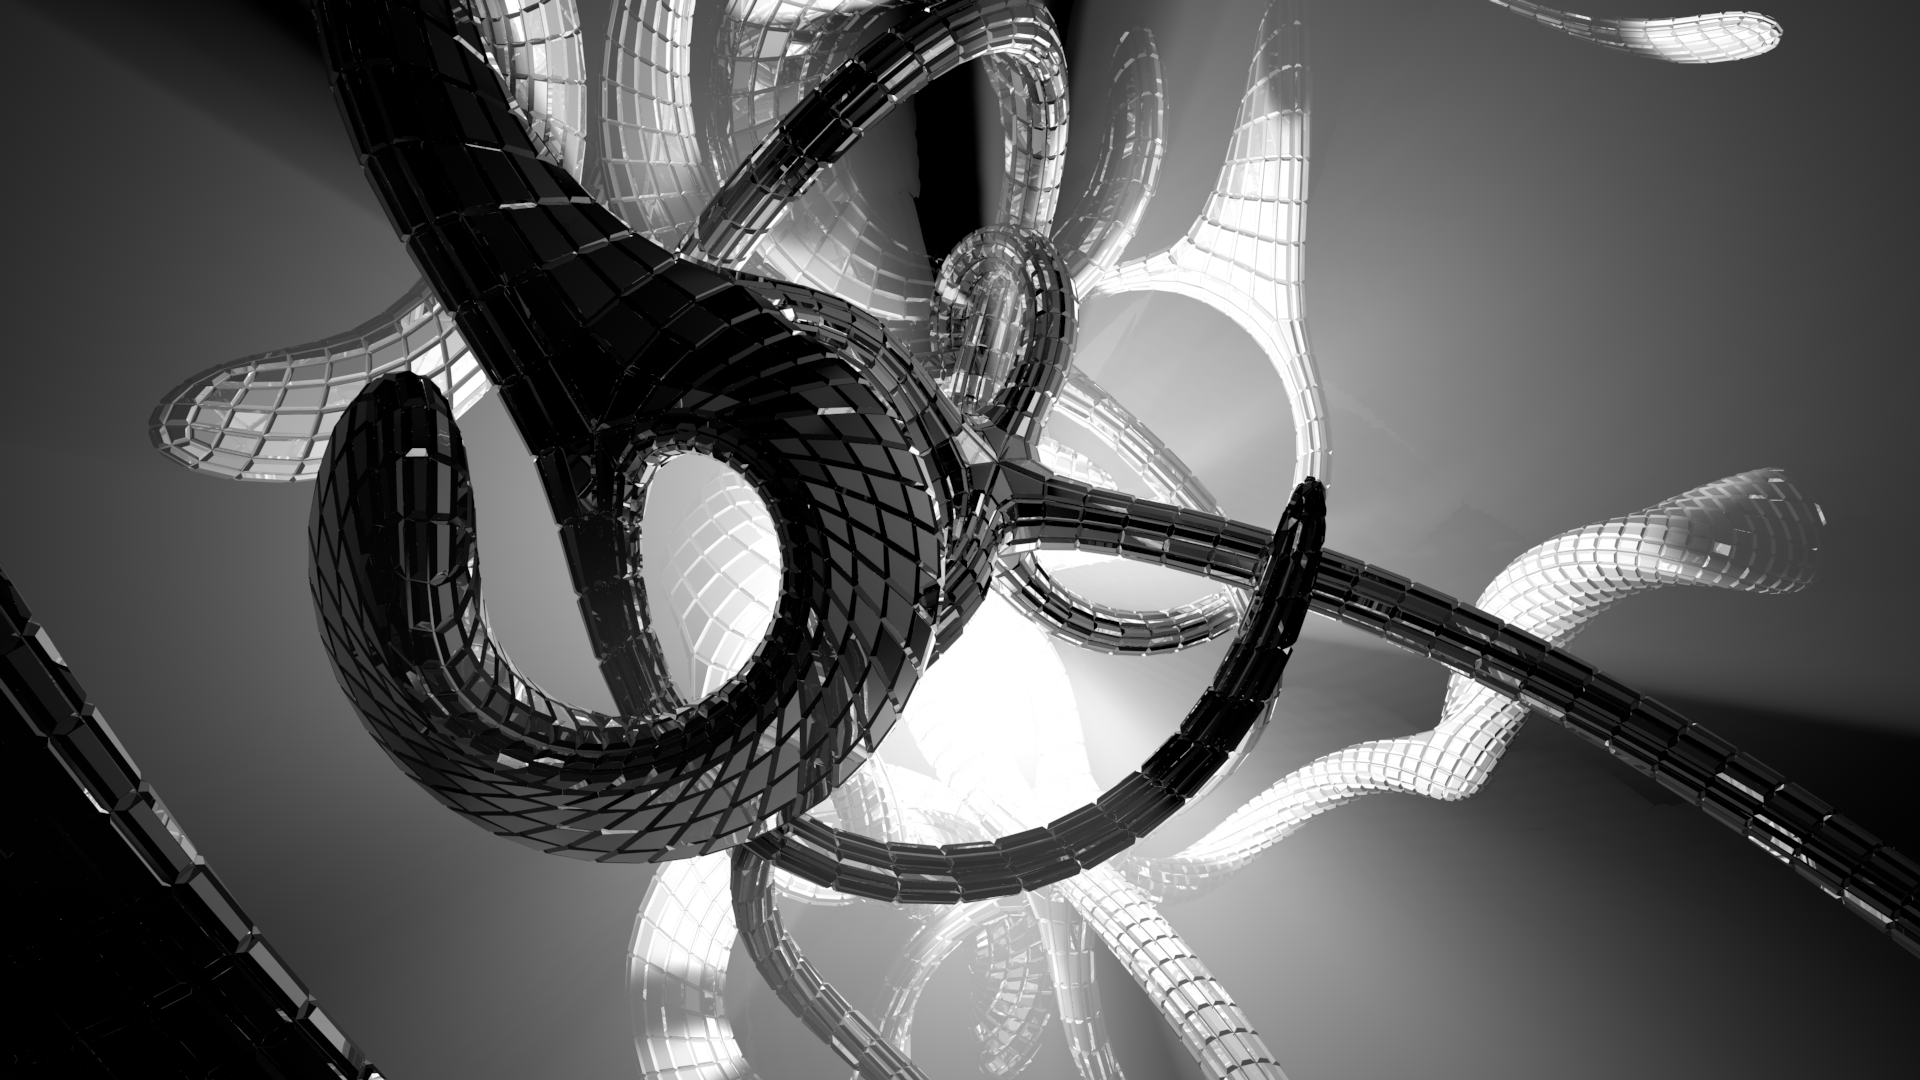 Abstract 3d Wallpaper - WallpaperSafari